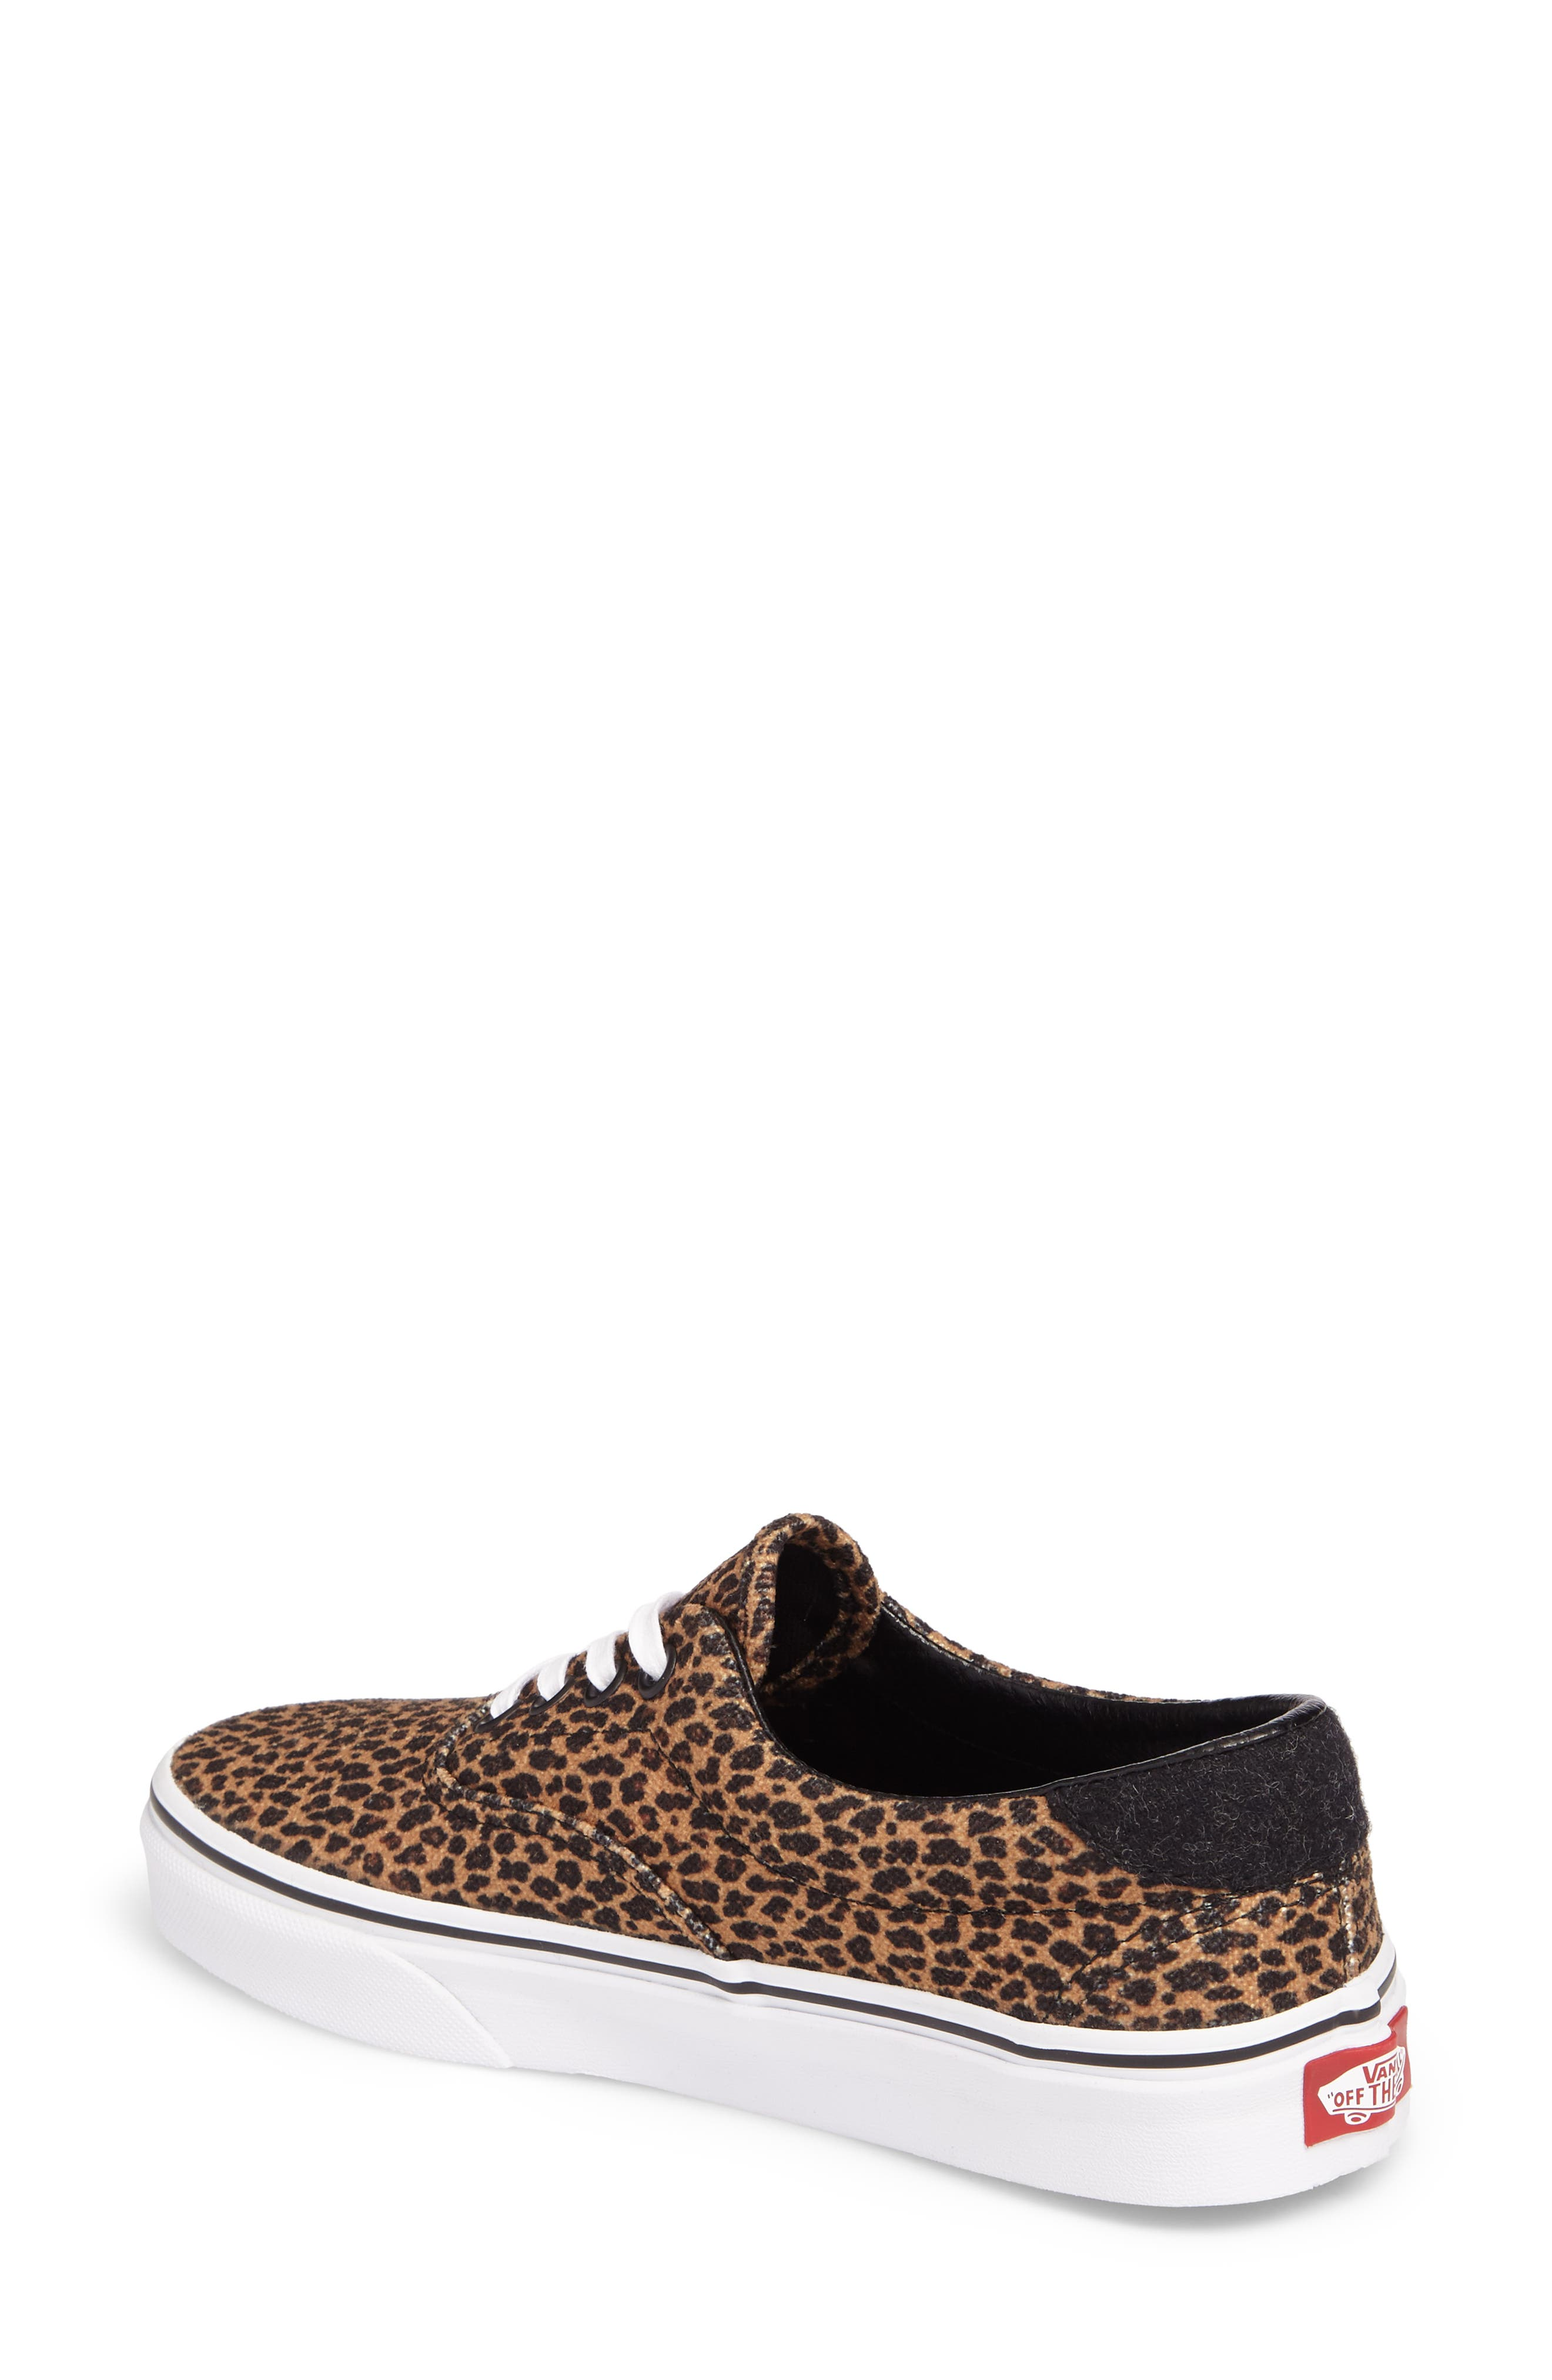 Alternate Image 2  - Vans Era 59 Sneaker (Women)